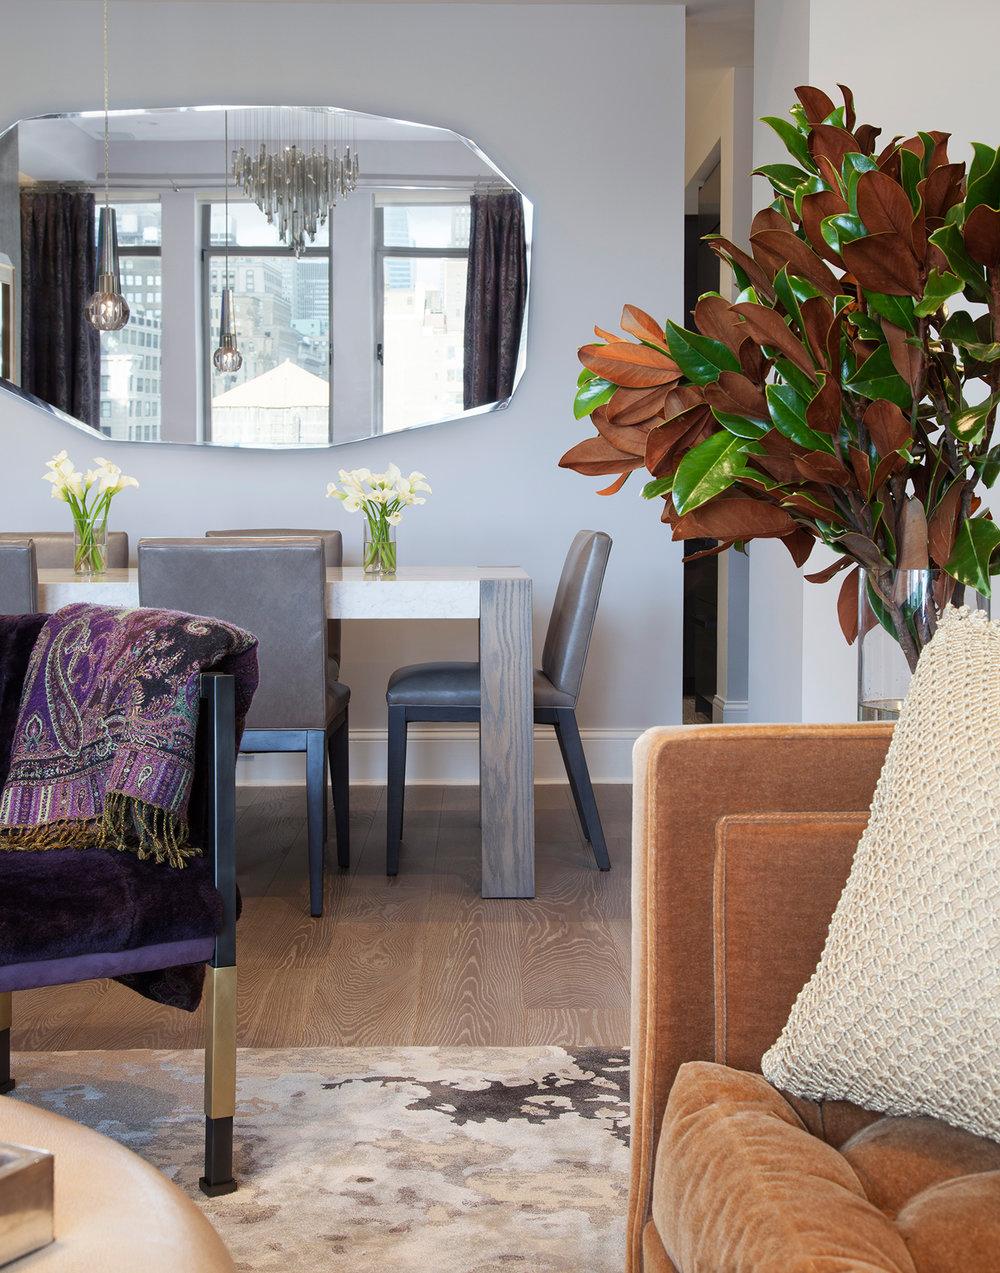 interior Design Photography in New York By Jonathan R. Bevkerman Design By Evelyn Benatar 7th Ave_Living Room Vinette 05.jpg